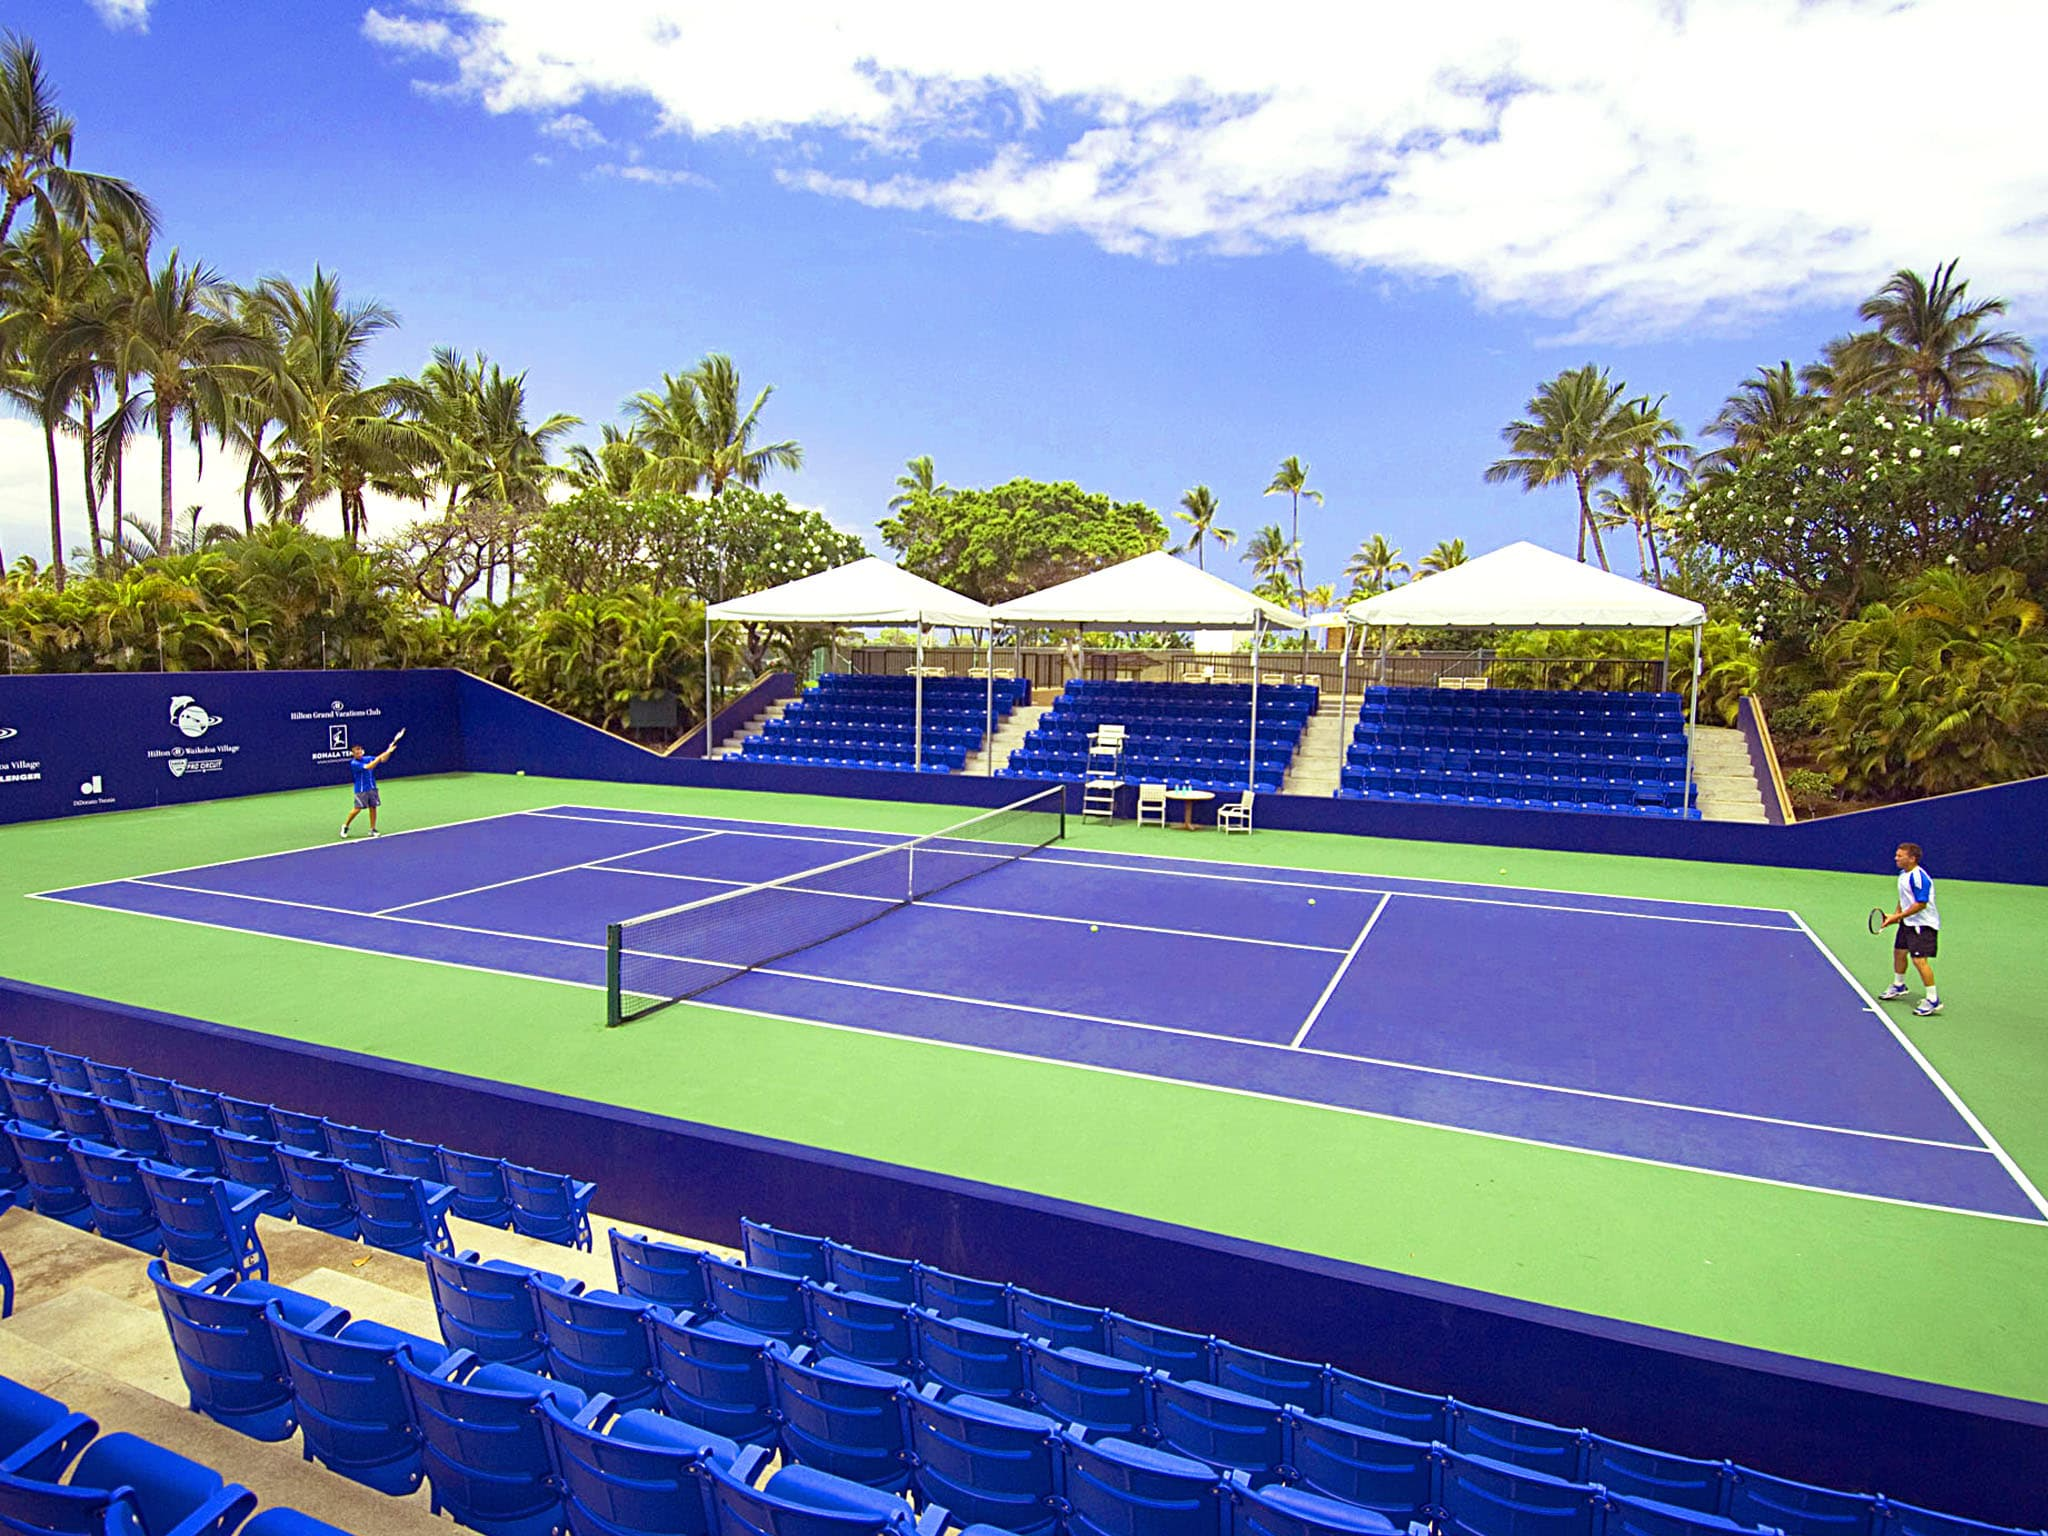 Hilton Waikoloa Tennis